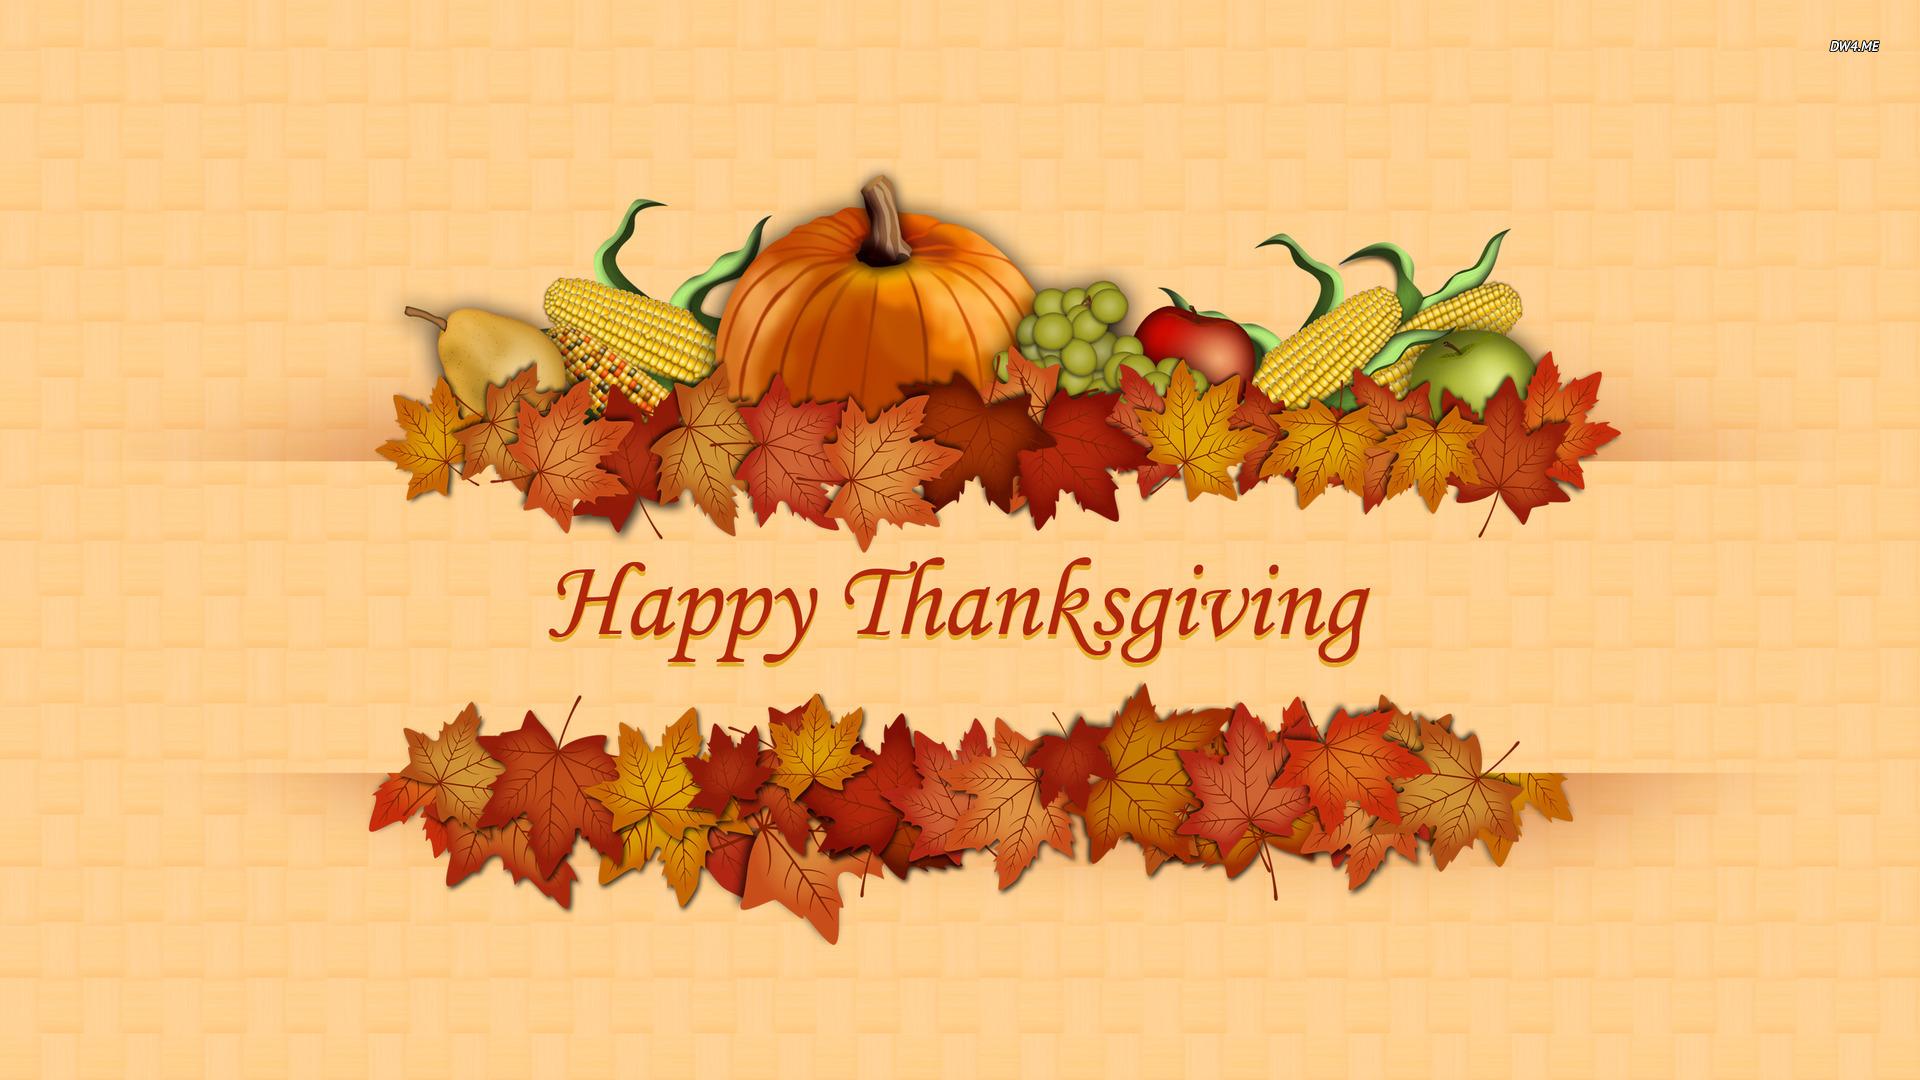 free happy thanksgiving 2013 wallpapers desktop backgrounds 1 1920x1080